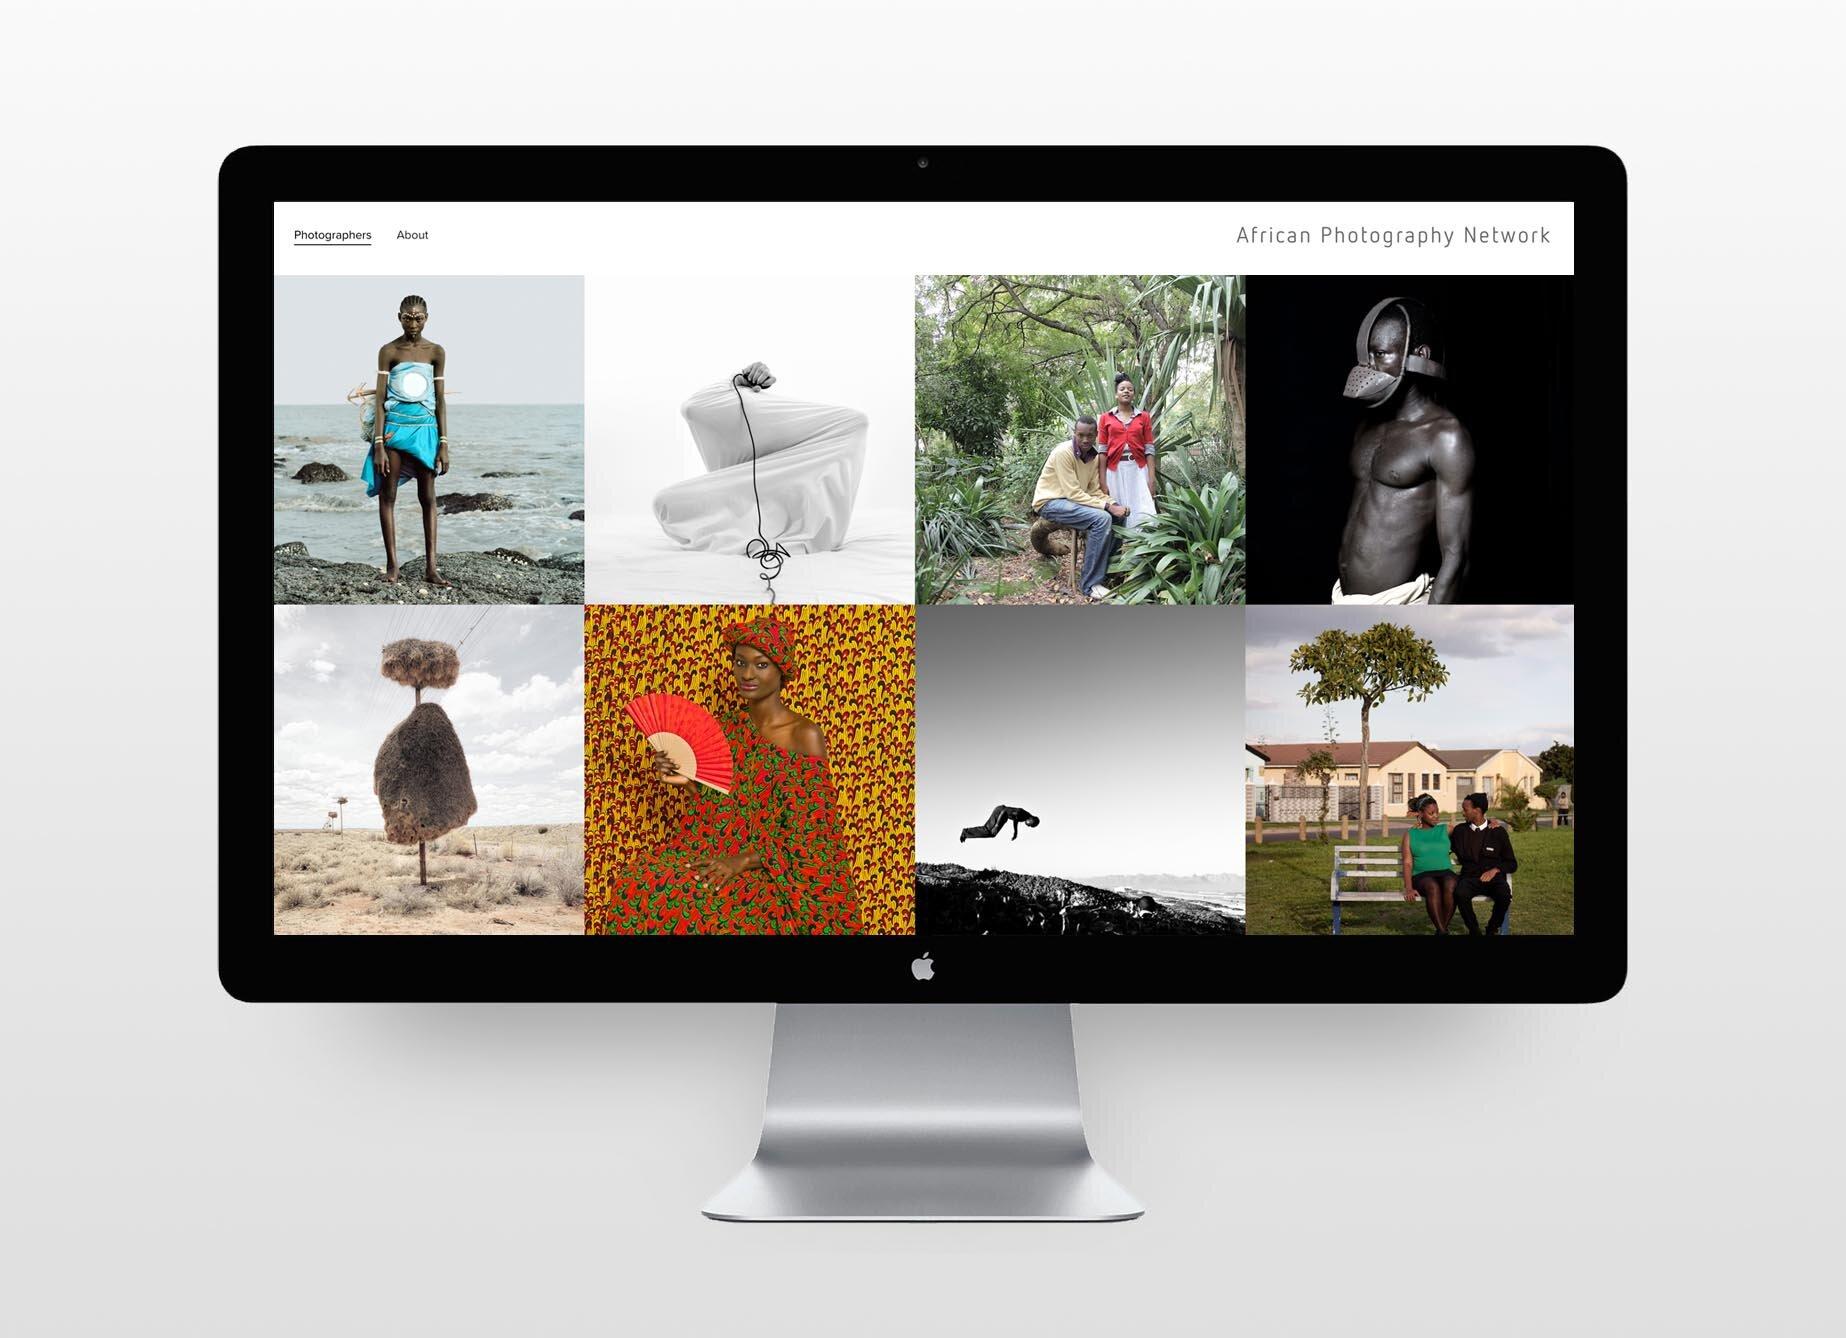 AfricanPhotographyNetwork_screen_02.jpg